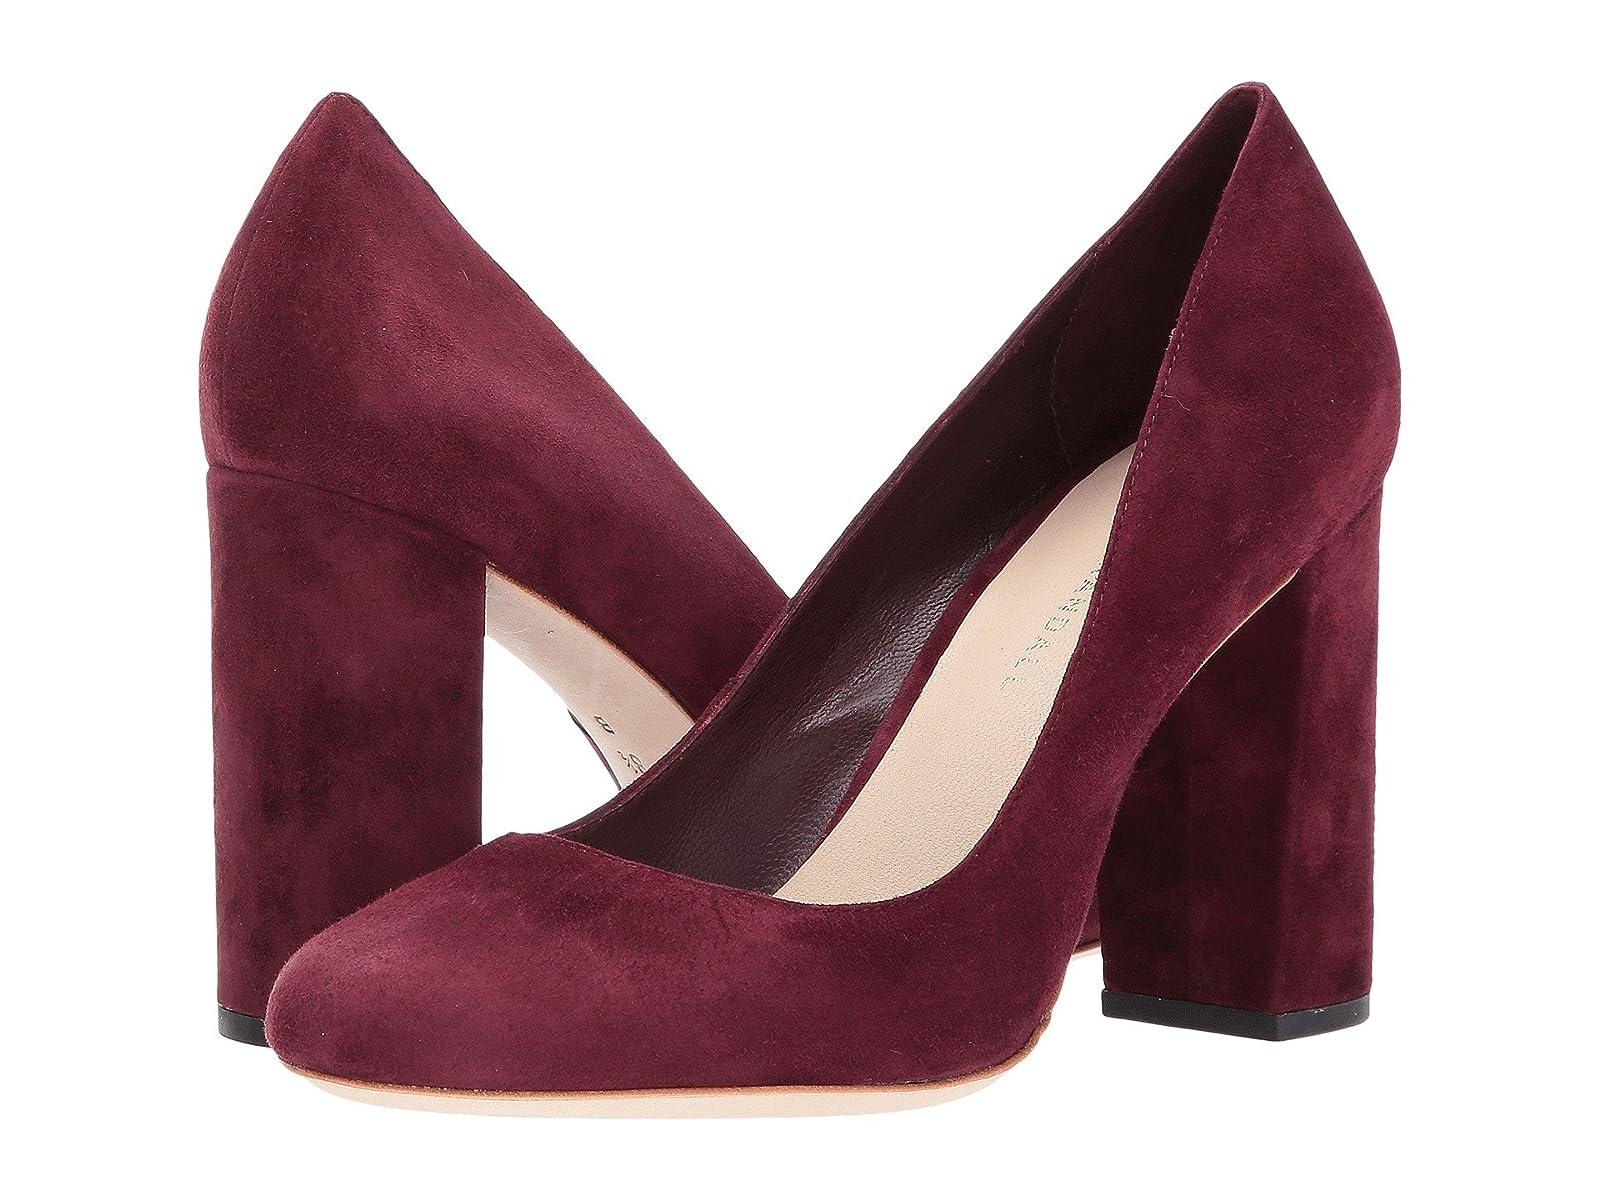 Loeffler Randall SydneeCheap and distinctive eye-catching shoes